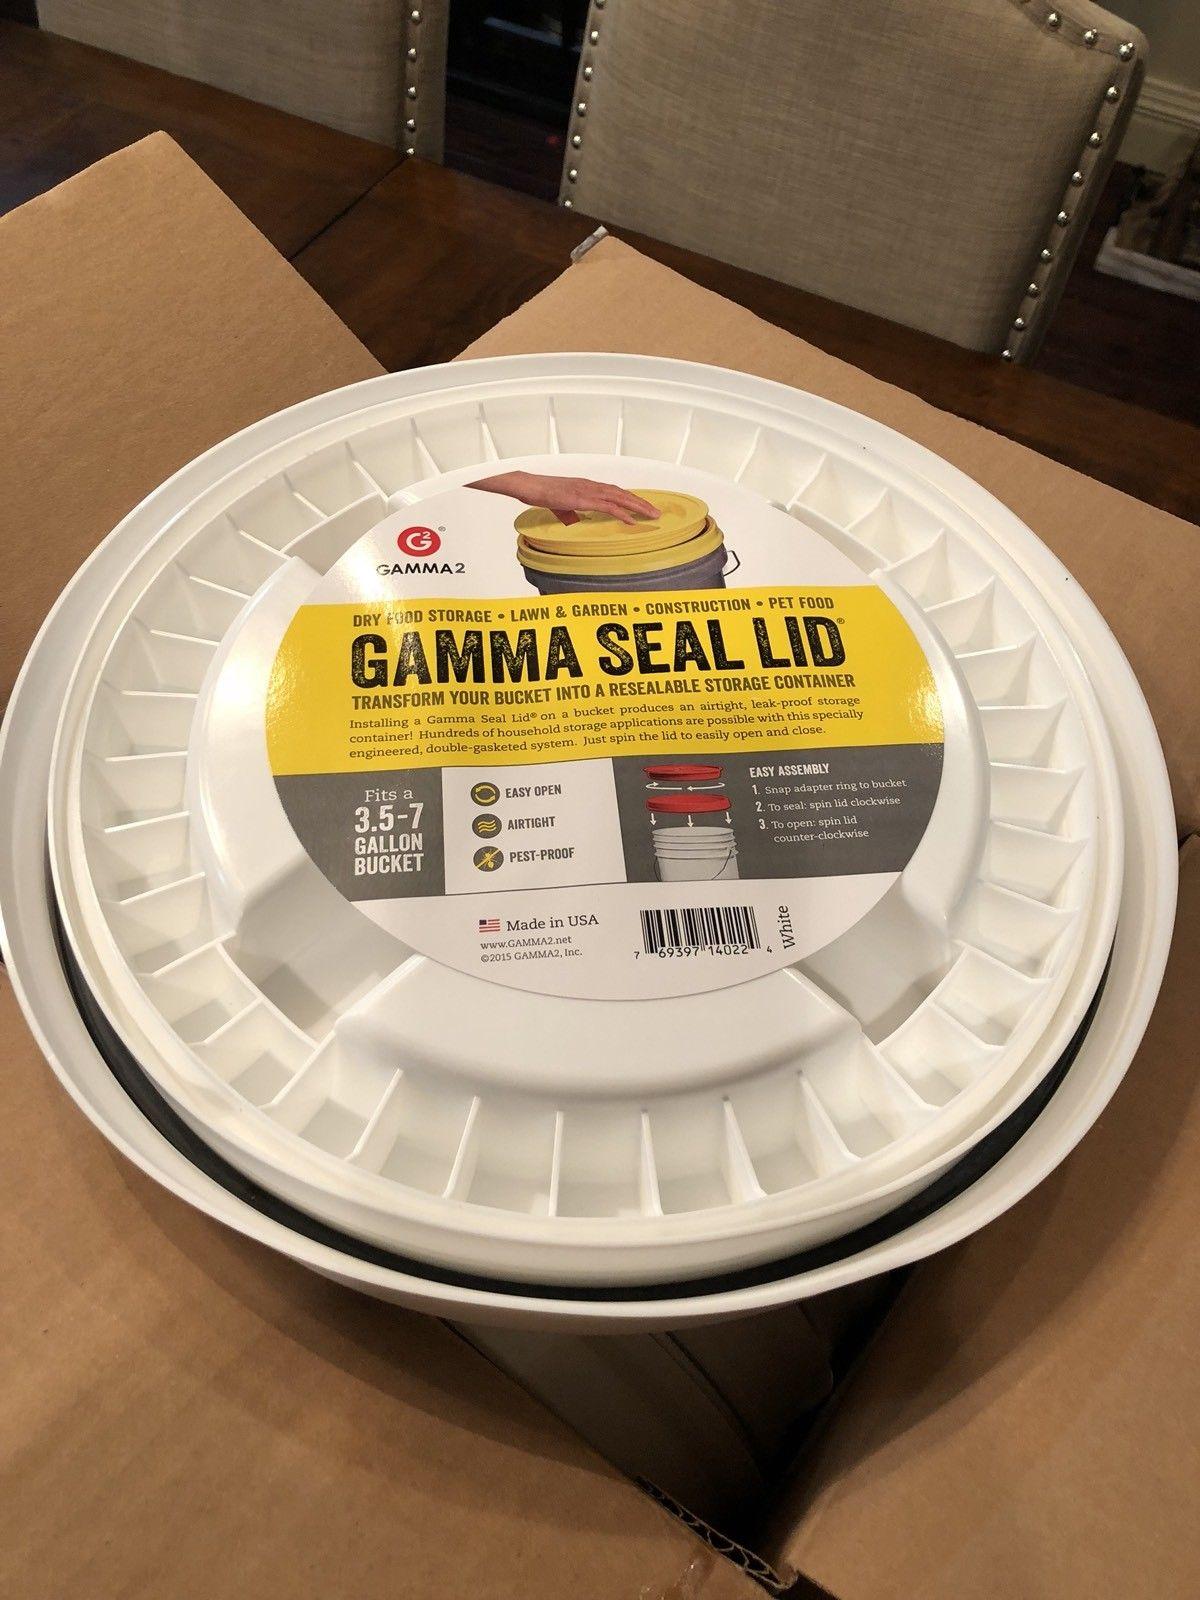 6-PACK! Gamma Seal Screw On Lids 3.5 -7 Gallon 5 Bucket Food Storage Airtight 1